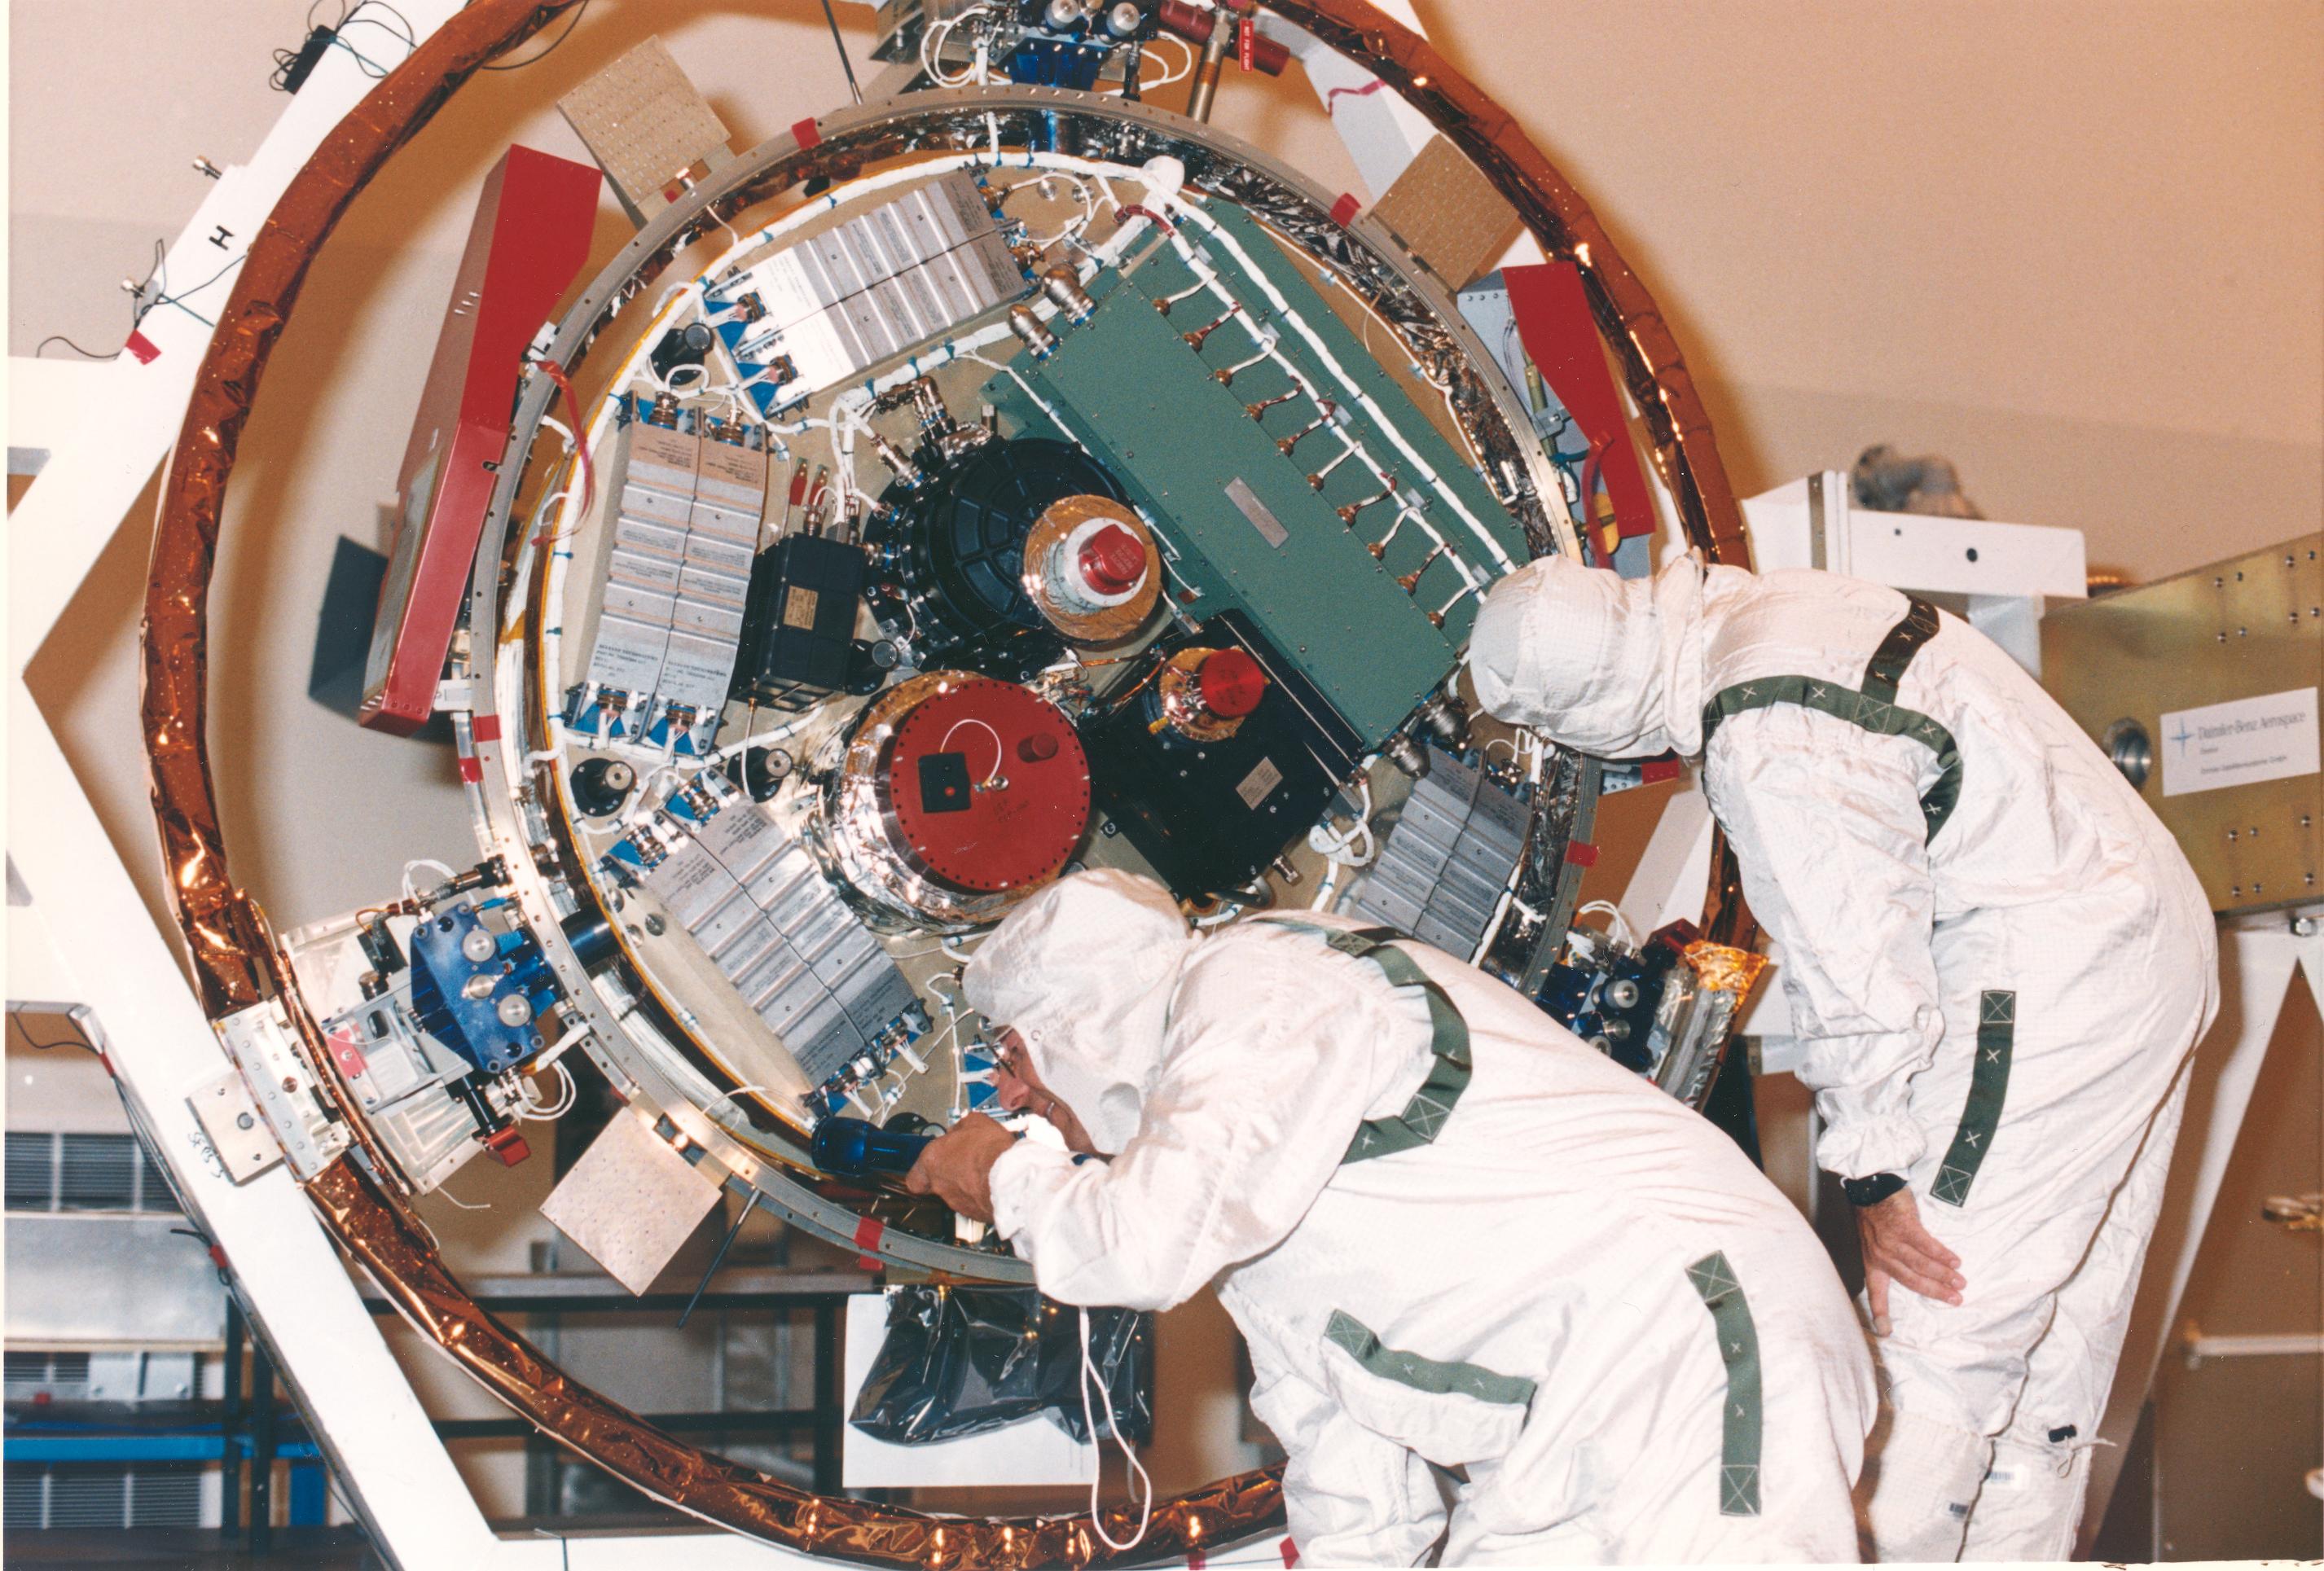 File:Huygens probe opened.jpg - Wikimedia Commons